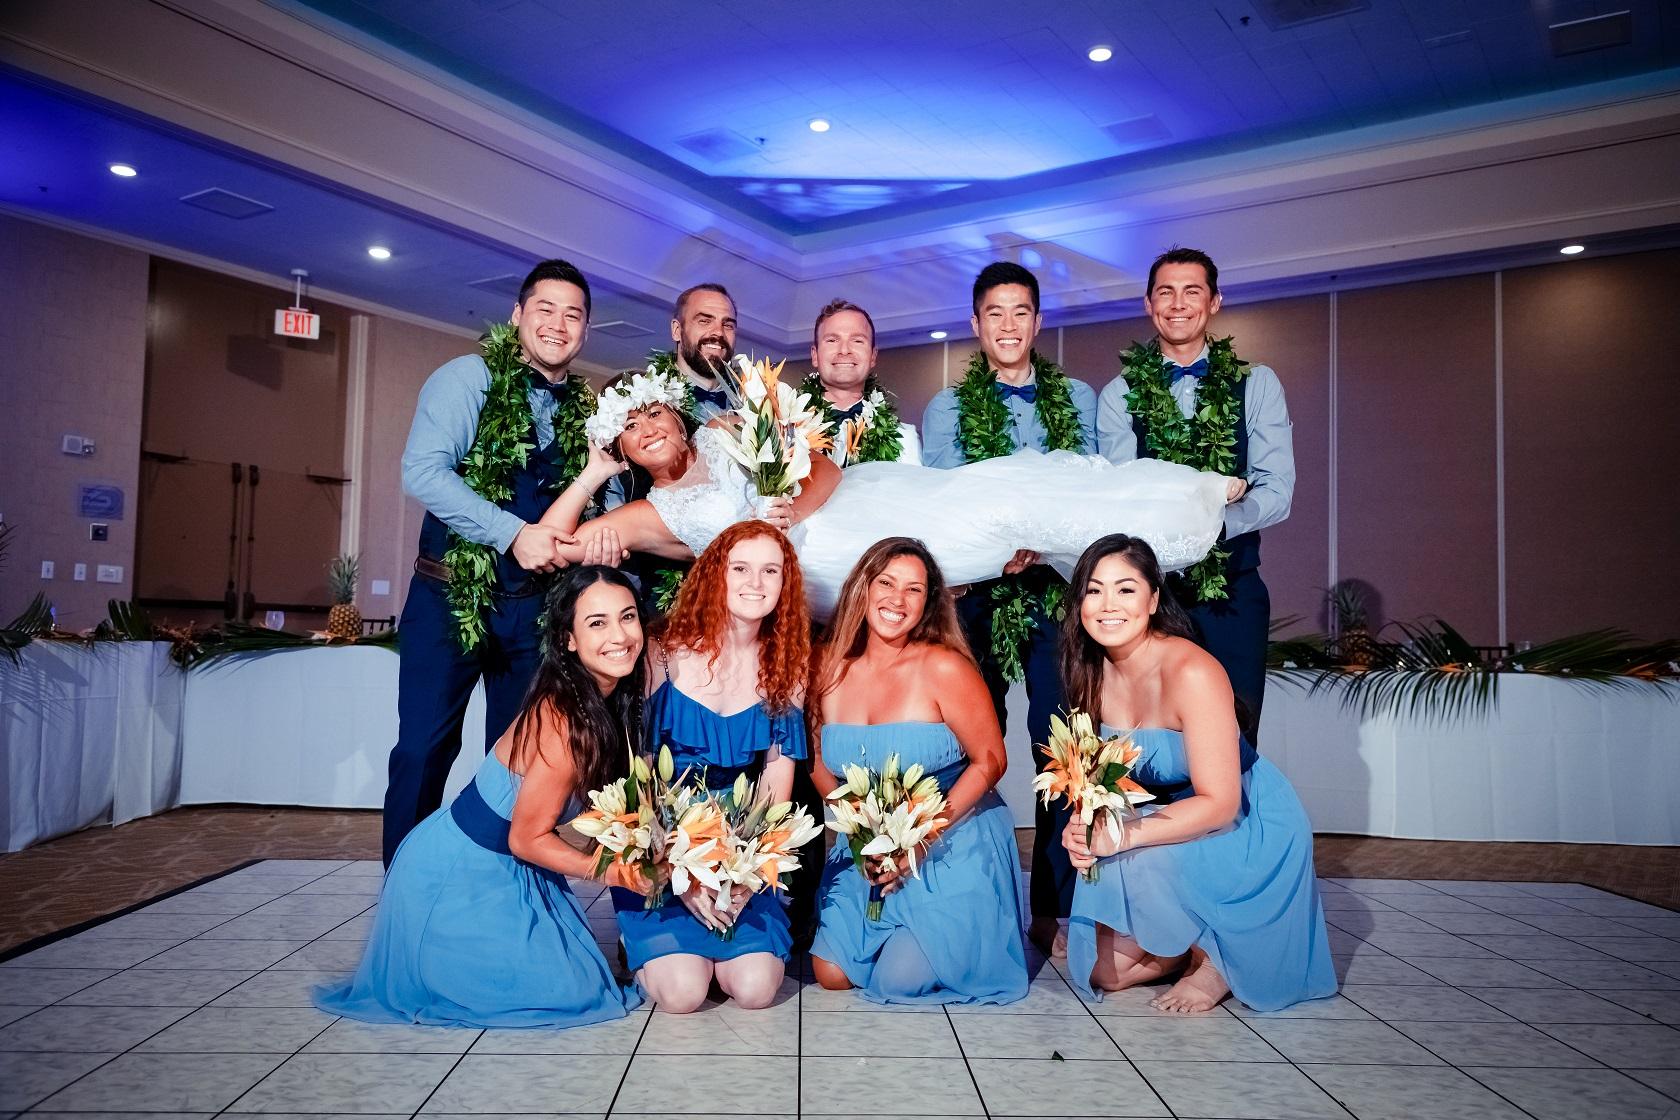 bridal party wedding reception portrait north shore oahu